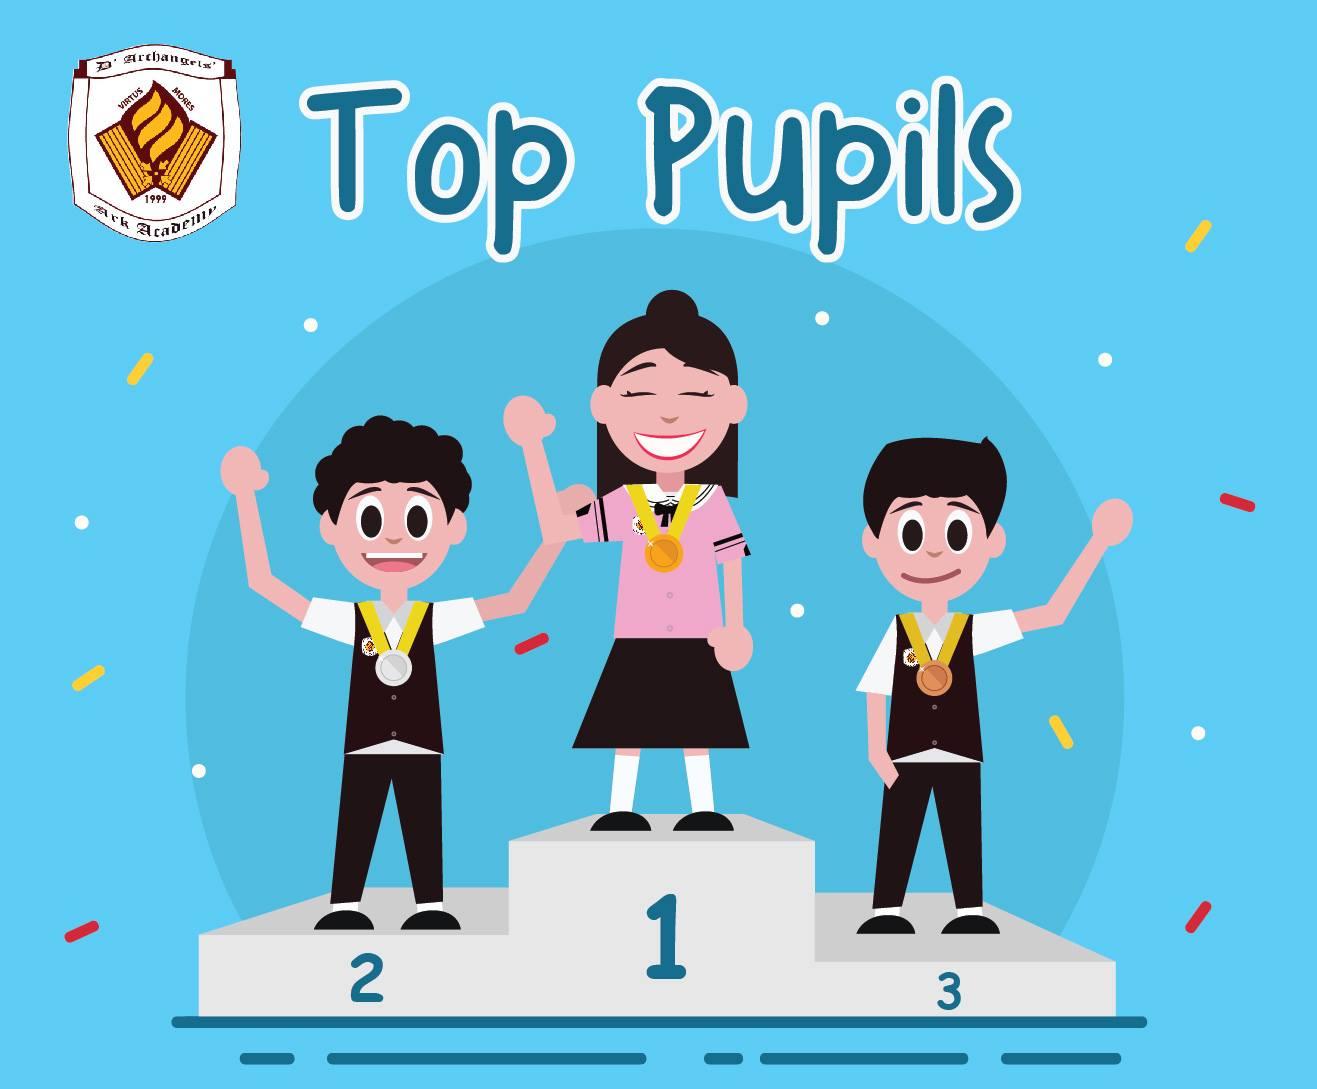 Top Pupils 1st Quarter SY 2018-19